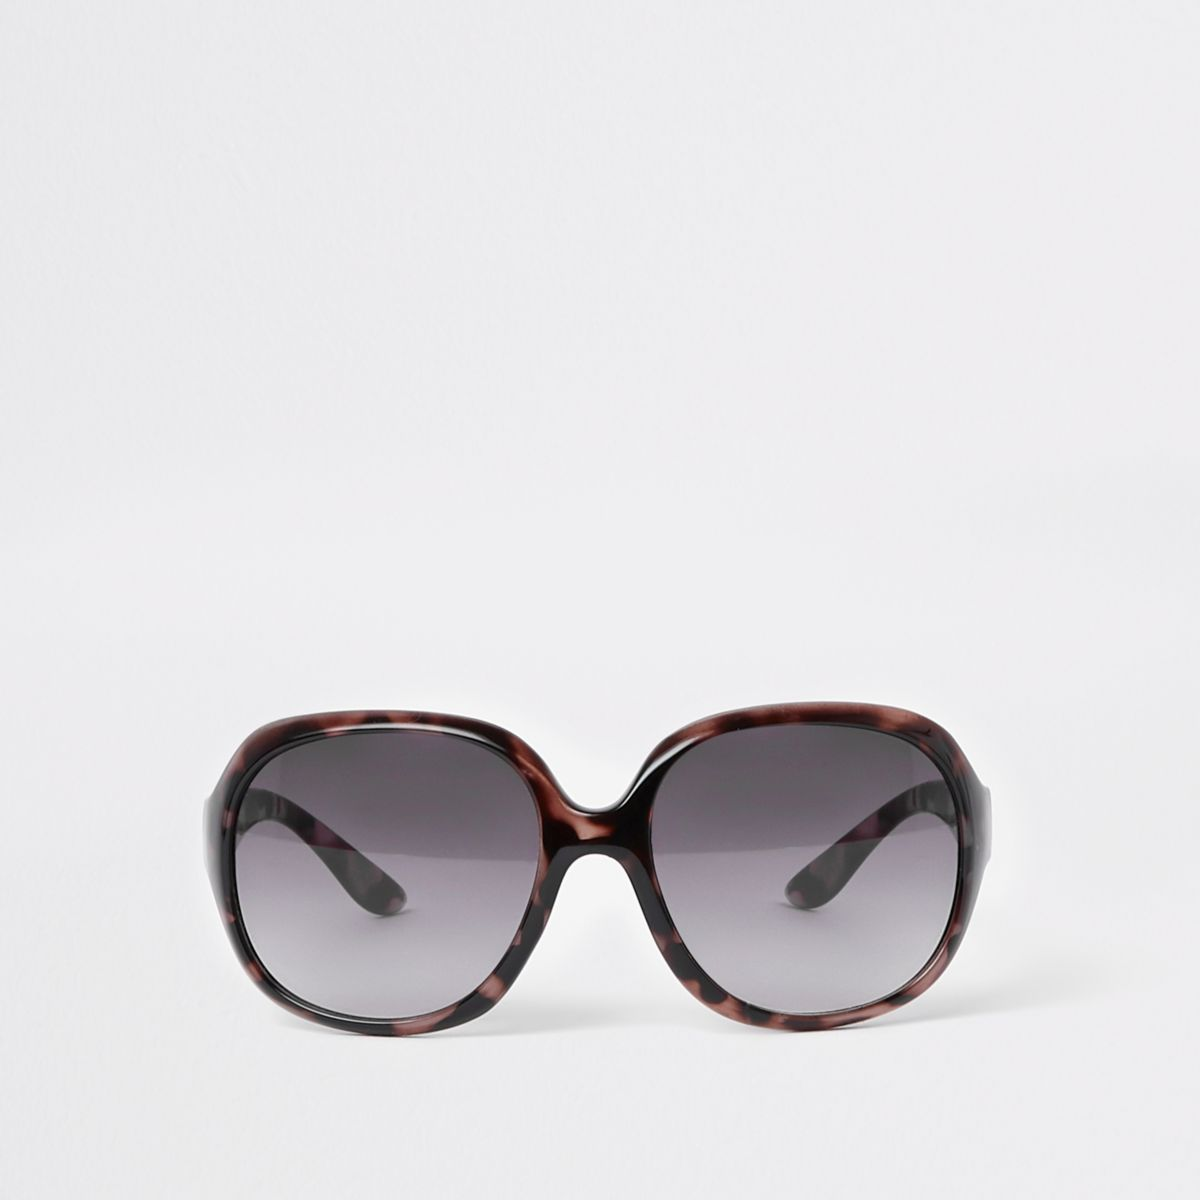 Mini Girls Black Tortoiseshell Sunglasses by River Island